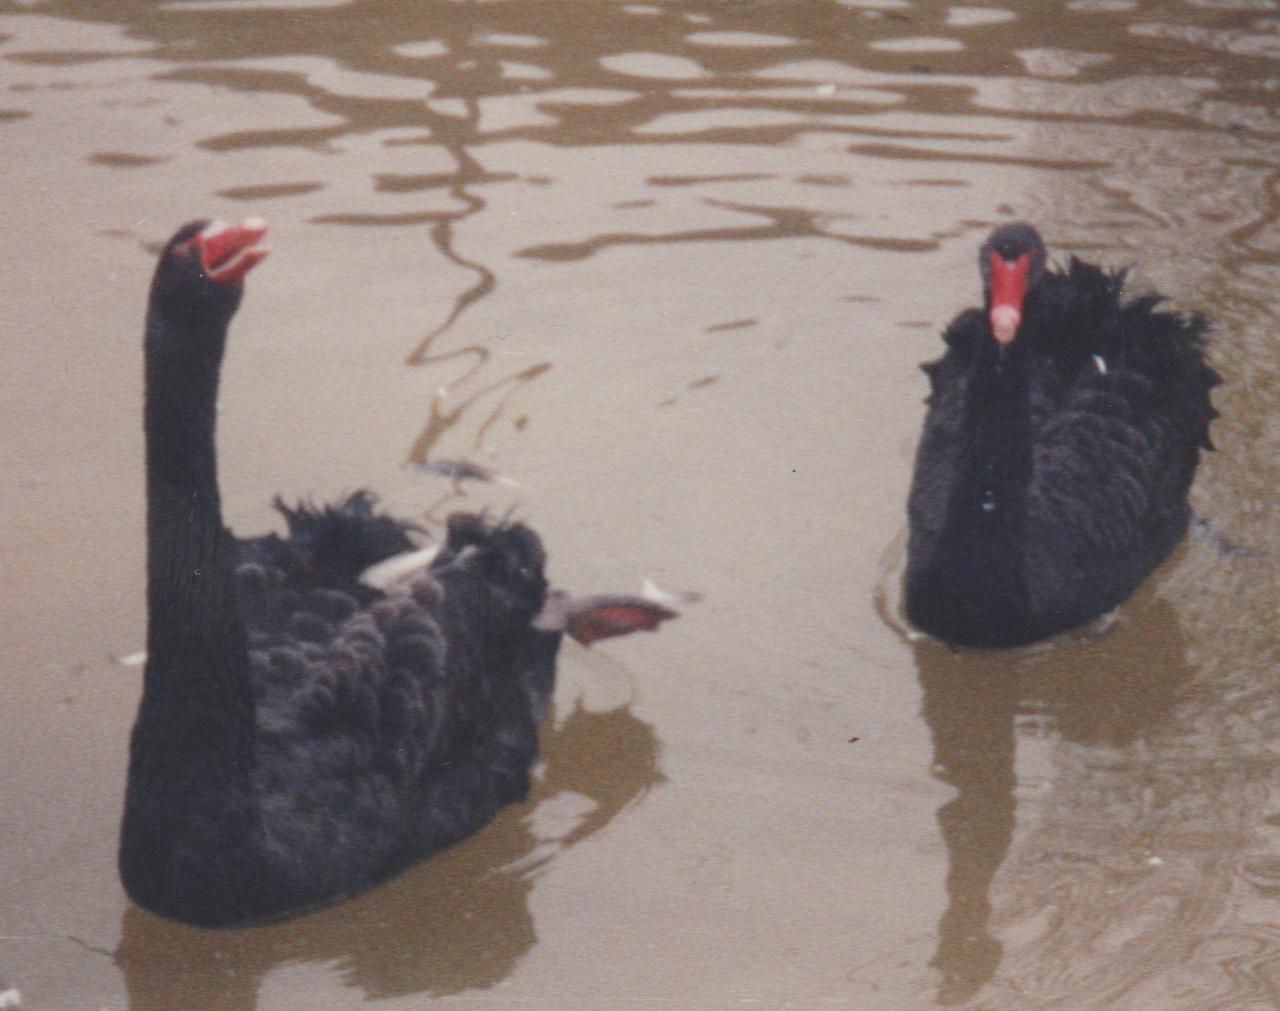 1992-12-26 - Saturday - Wildlife Safari Trip, Marilyn, Crystal-22.png